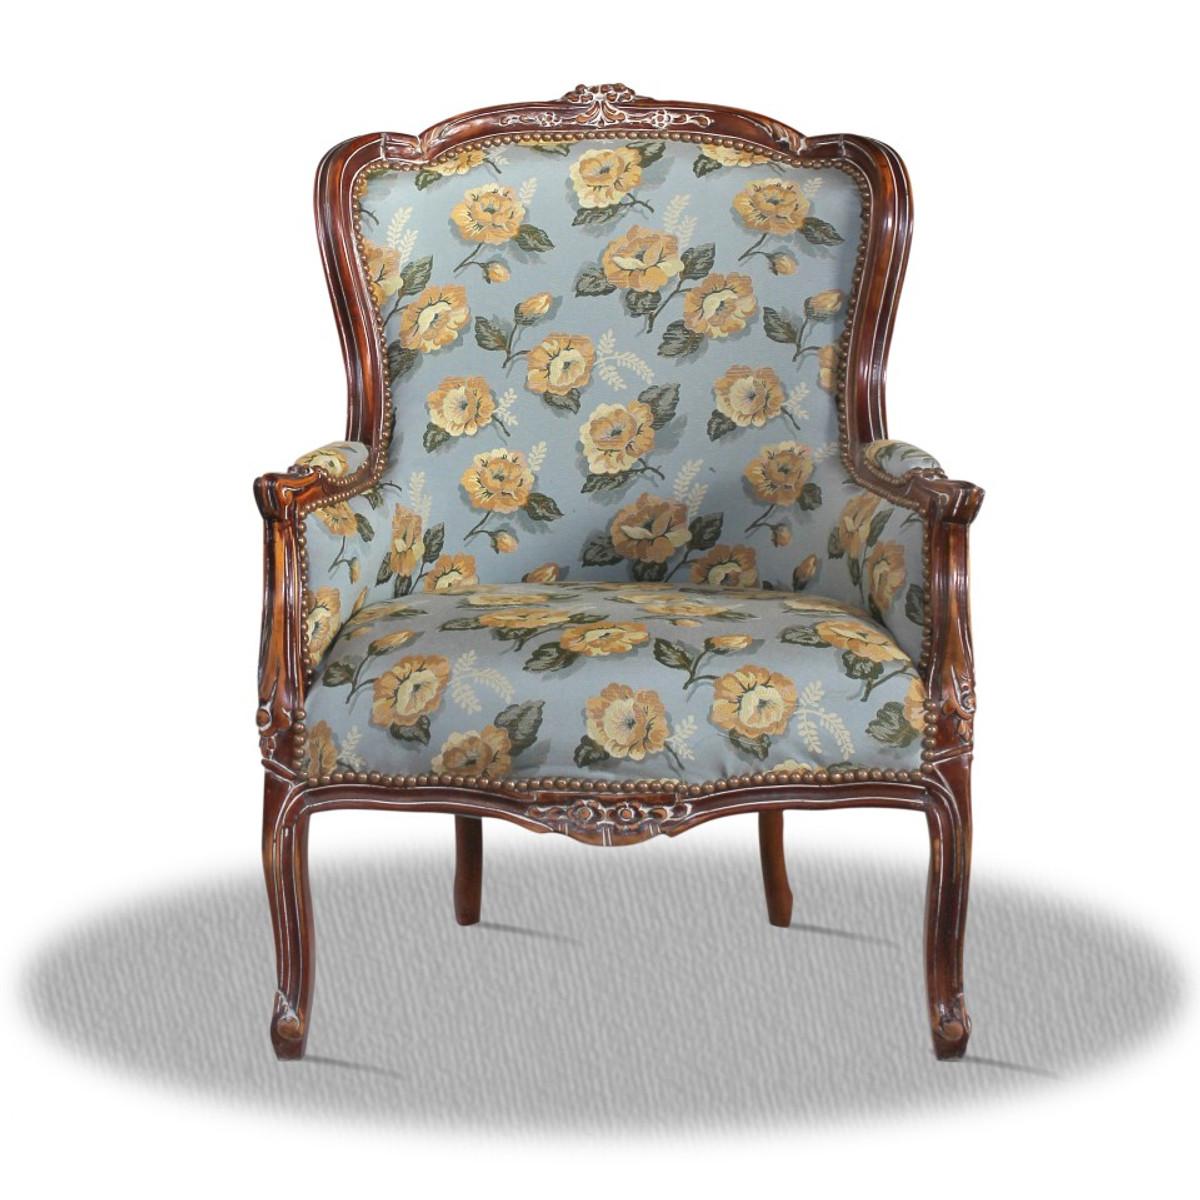 casa padrino barock sessel mit blumenmuster hotel kollektion sessel barock salon sessel. Black Bedroom Furniture Sets. Home Design Ideas